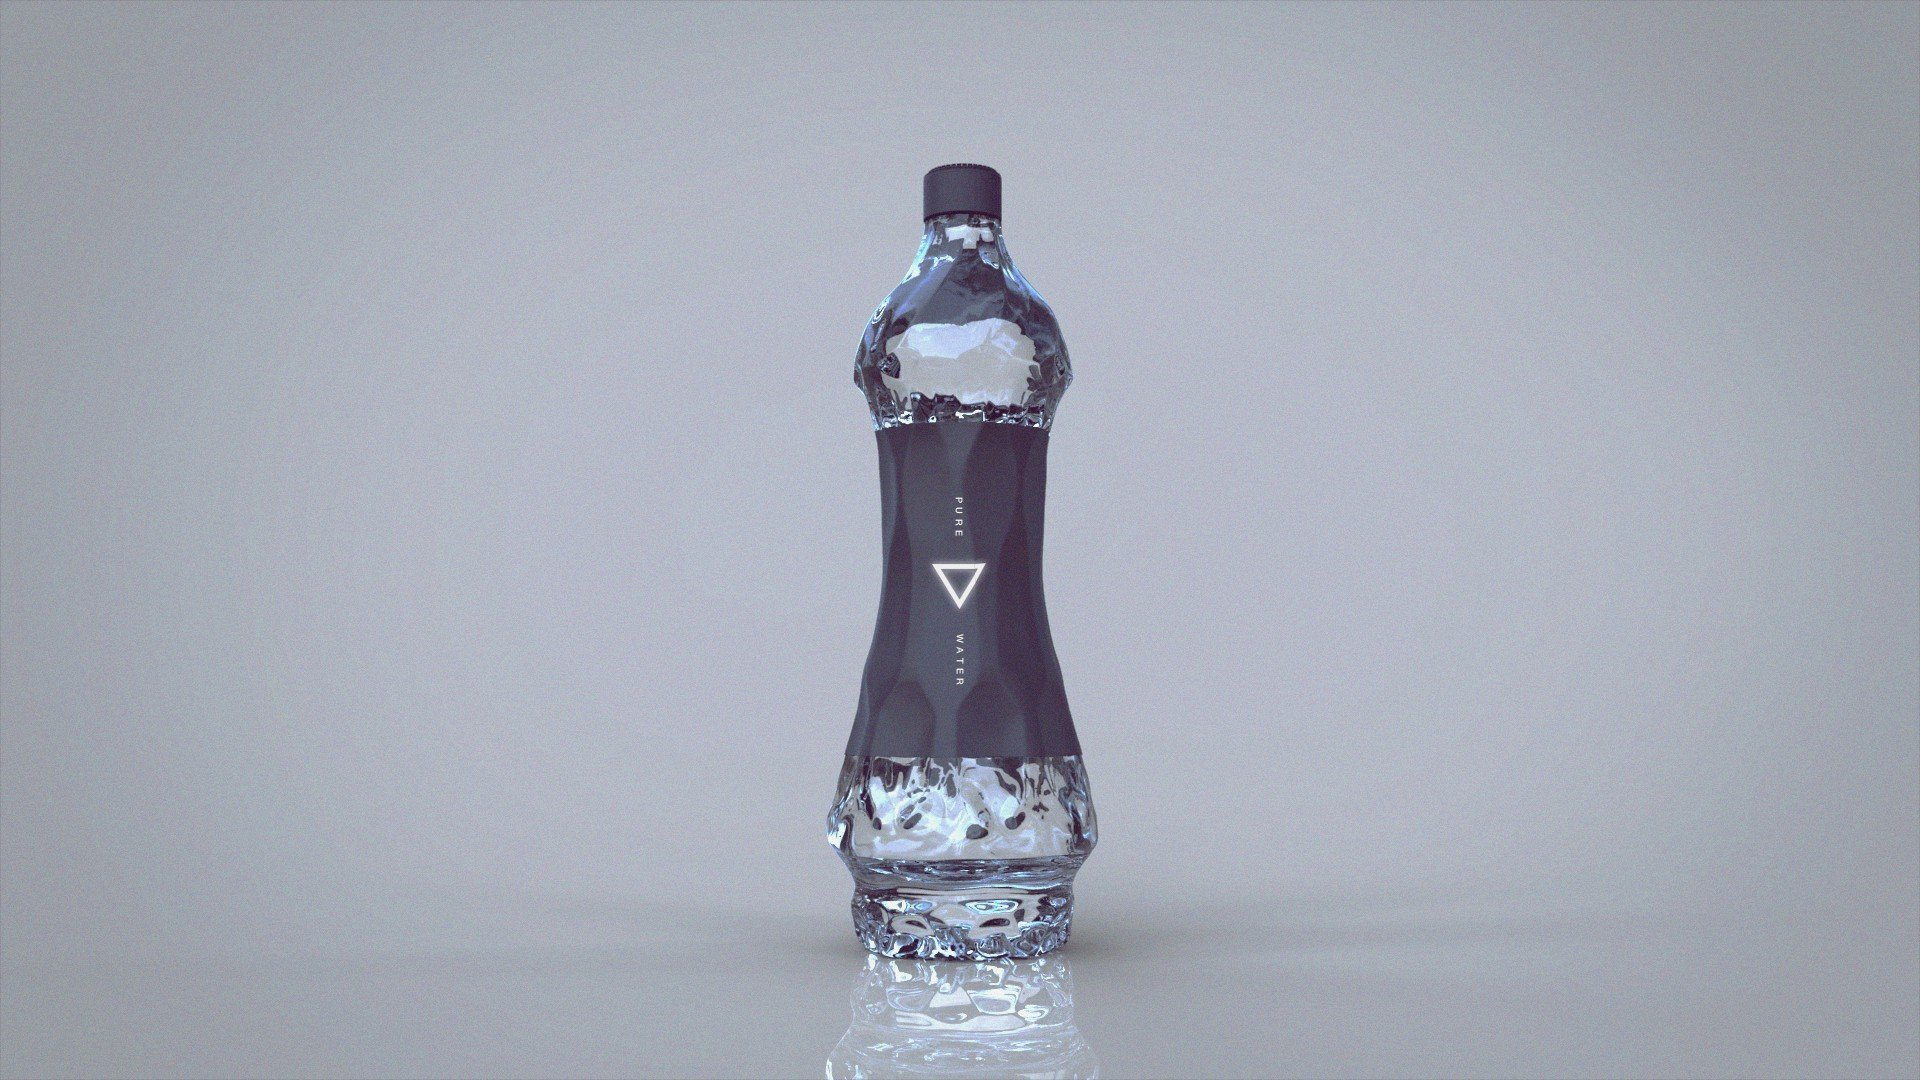 Mark chang bottle